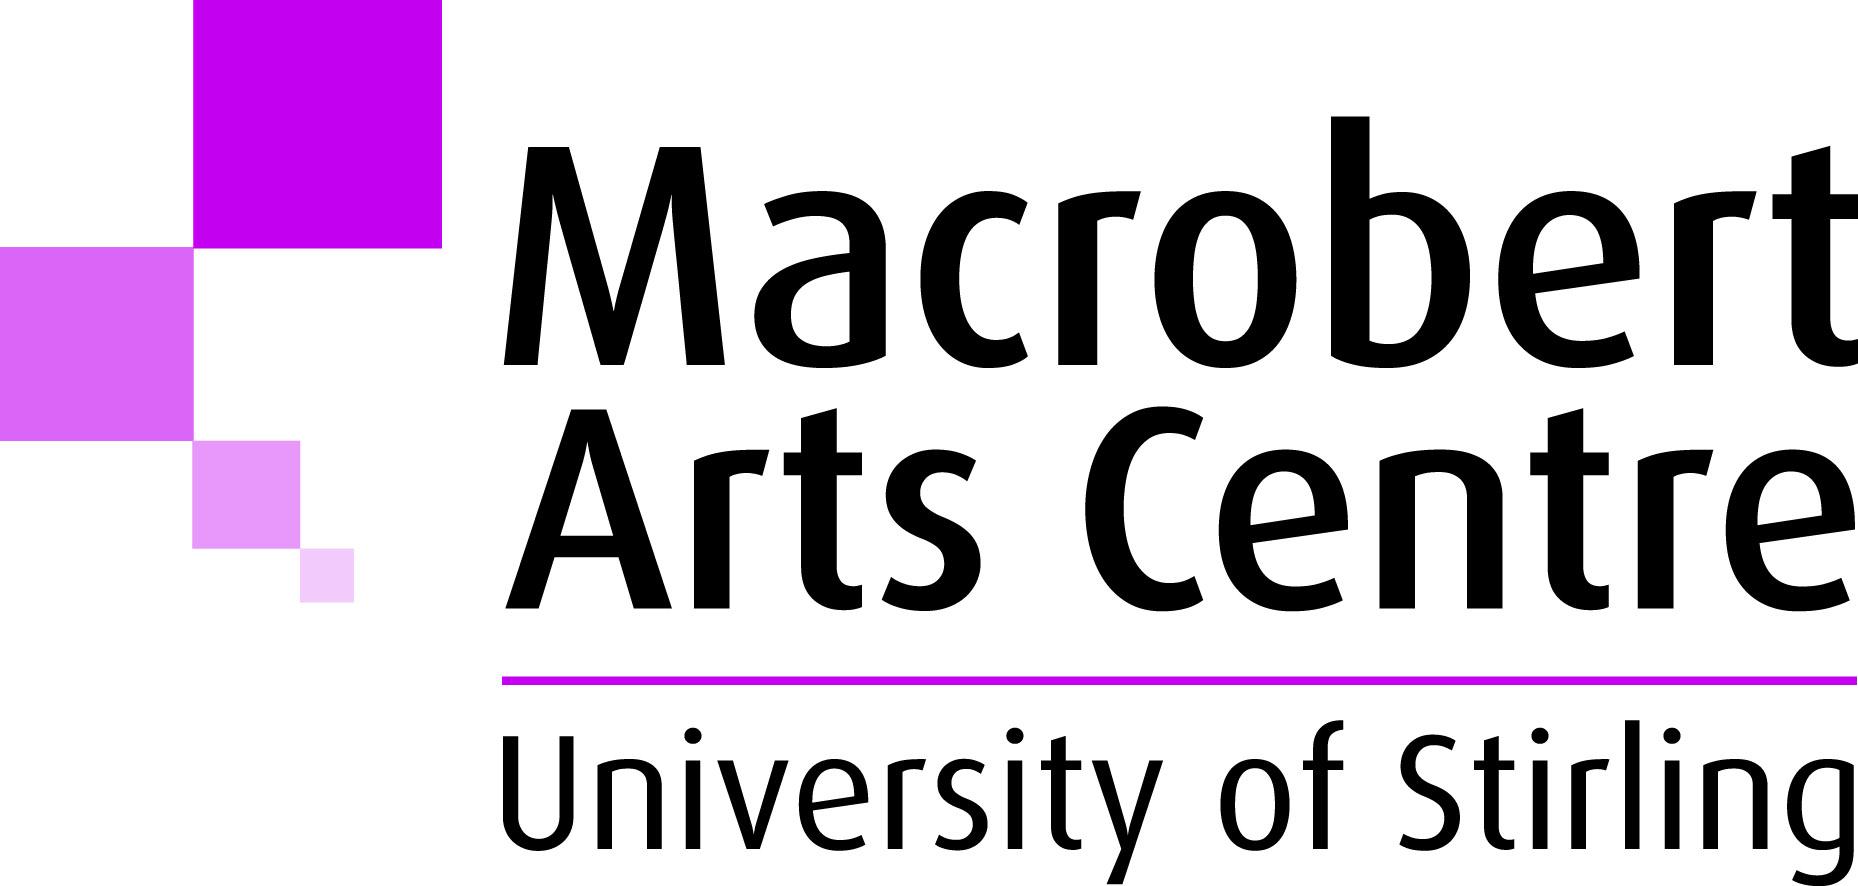 Macrobert Arts Centre